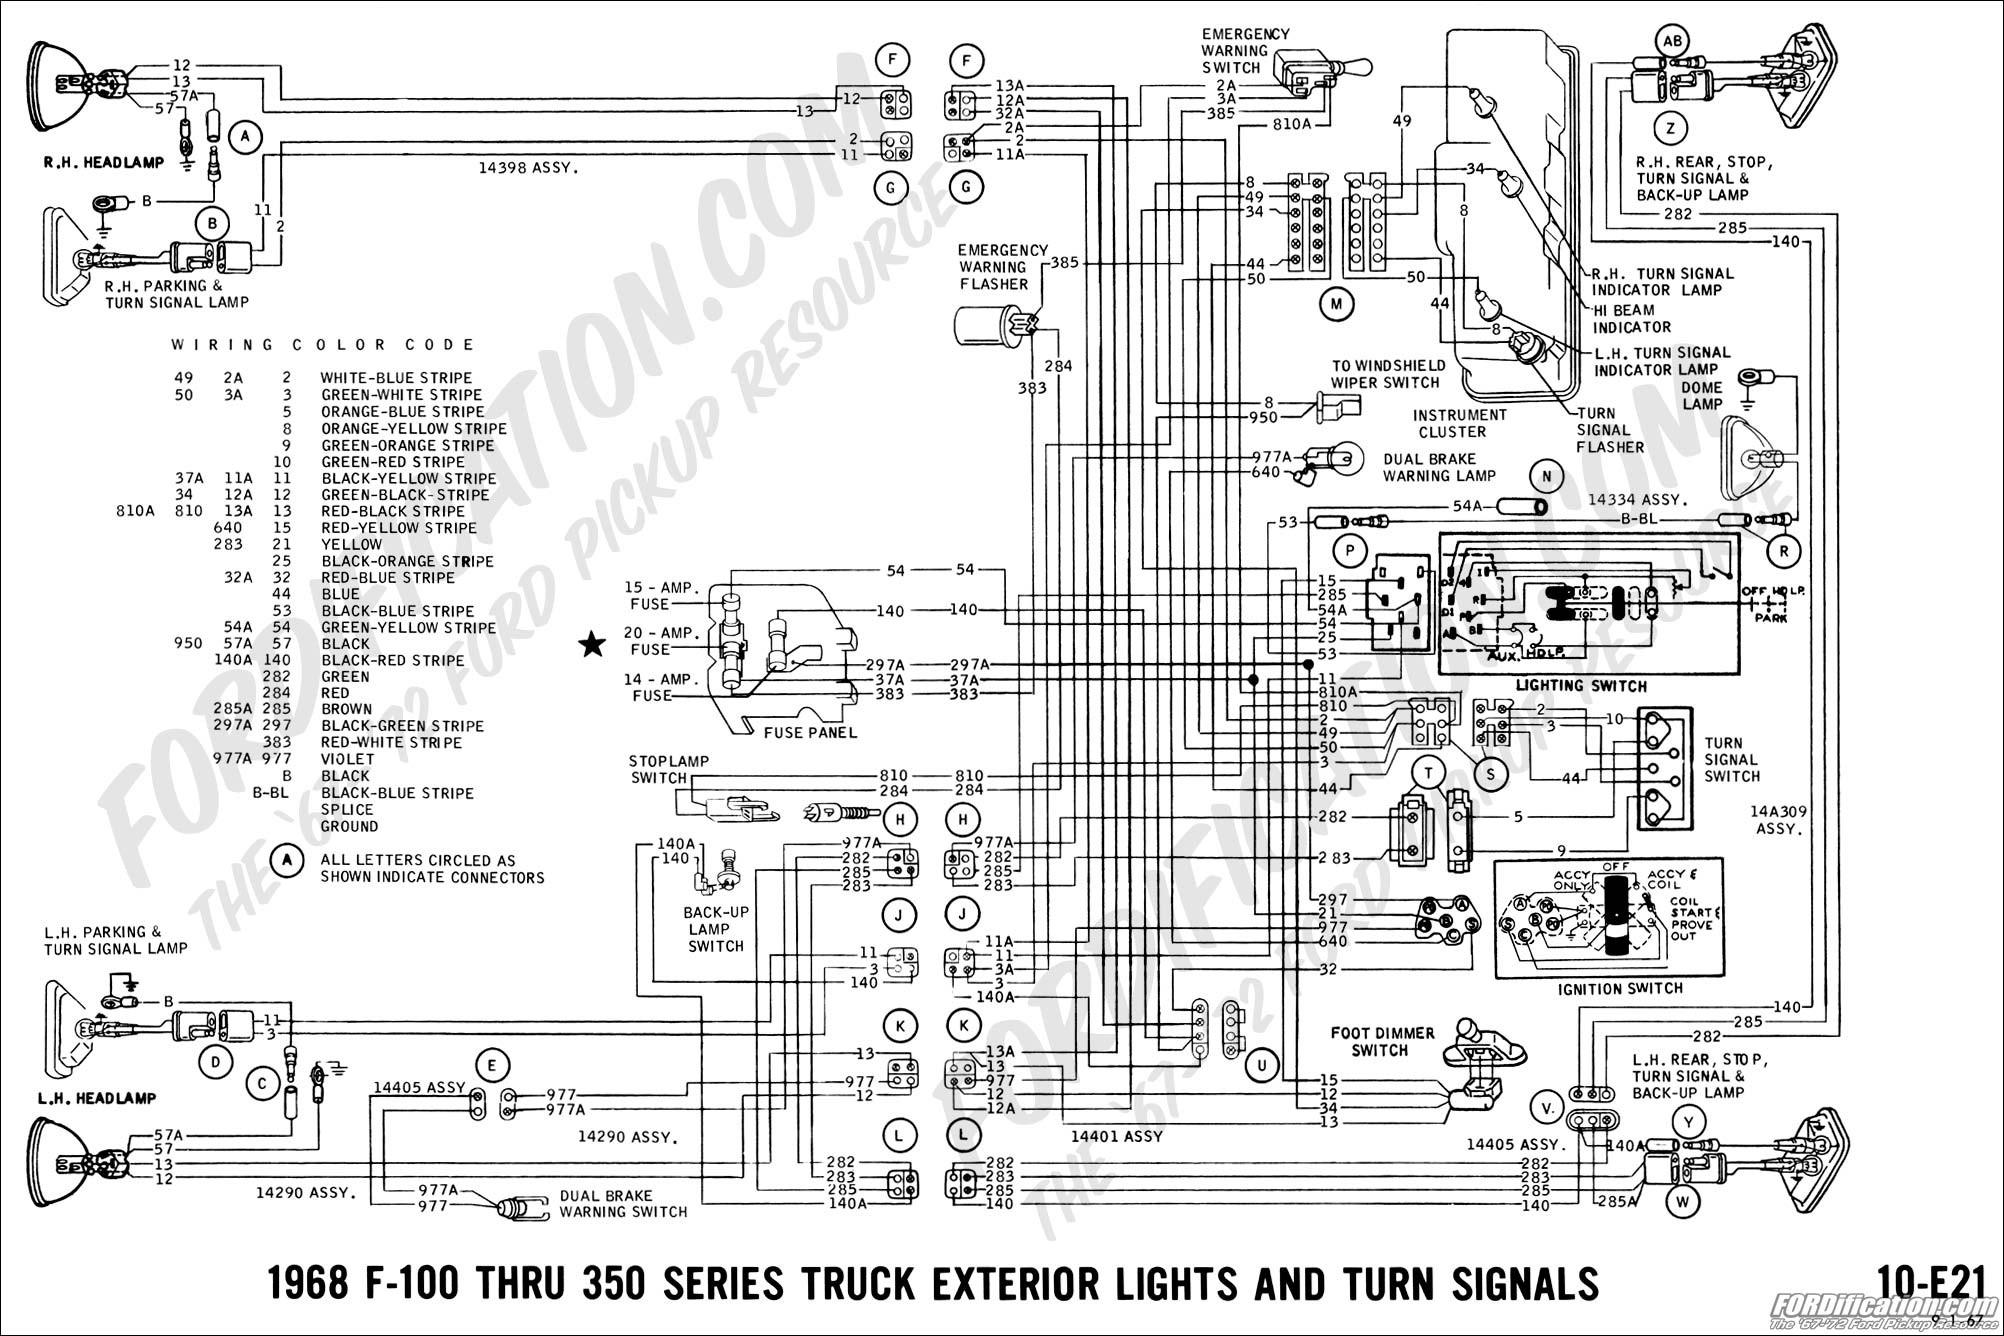 1999 ford F250 Brake Lights Wiring Diagram 688 ford F 350 Tail Light Wiring Diagram Of 1999 ford F250 Brake Lights Wiring Diagram